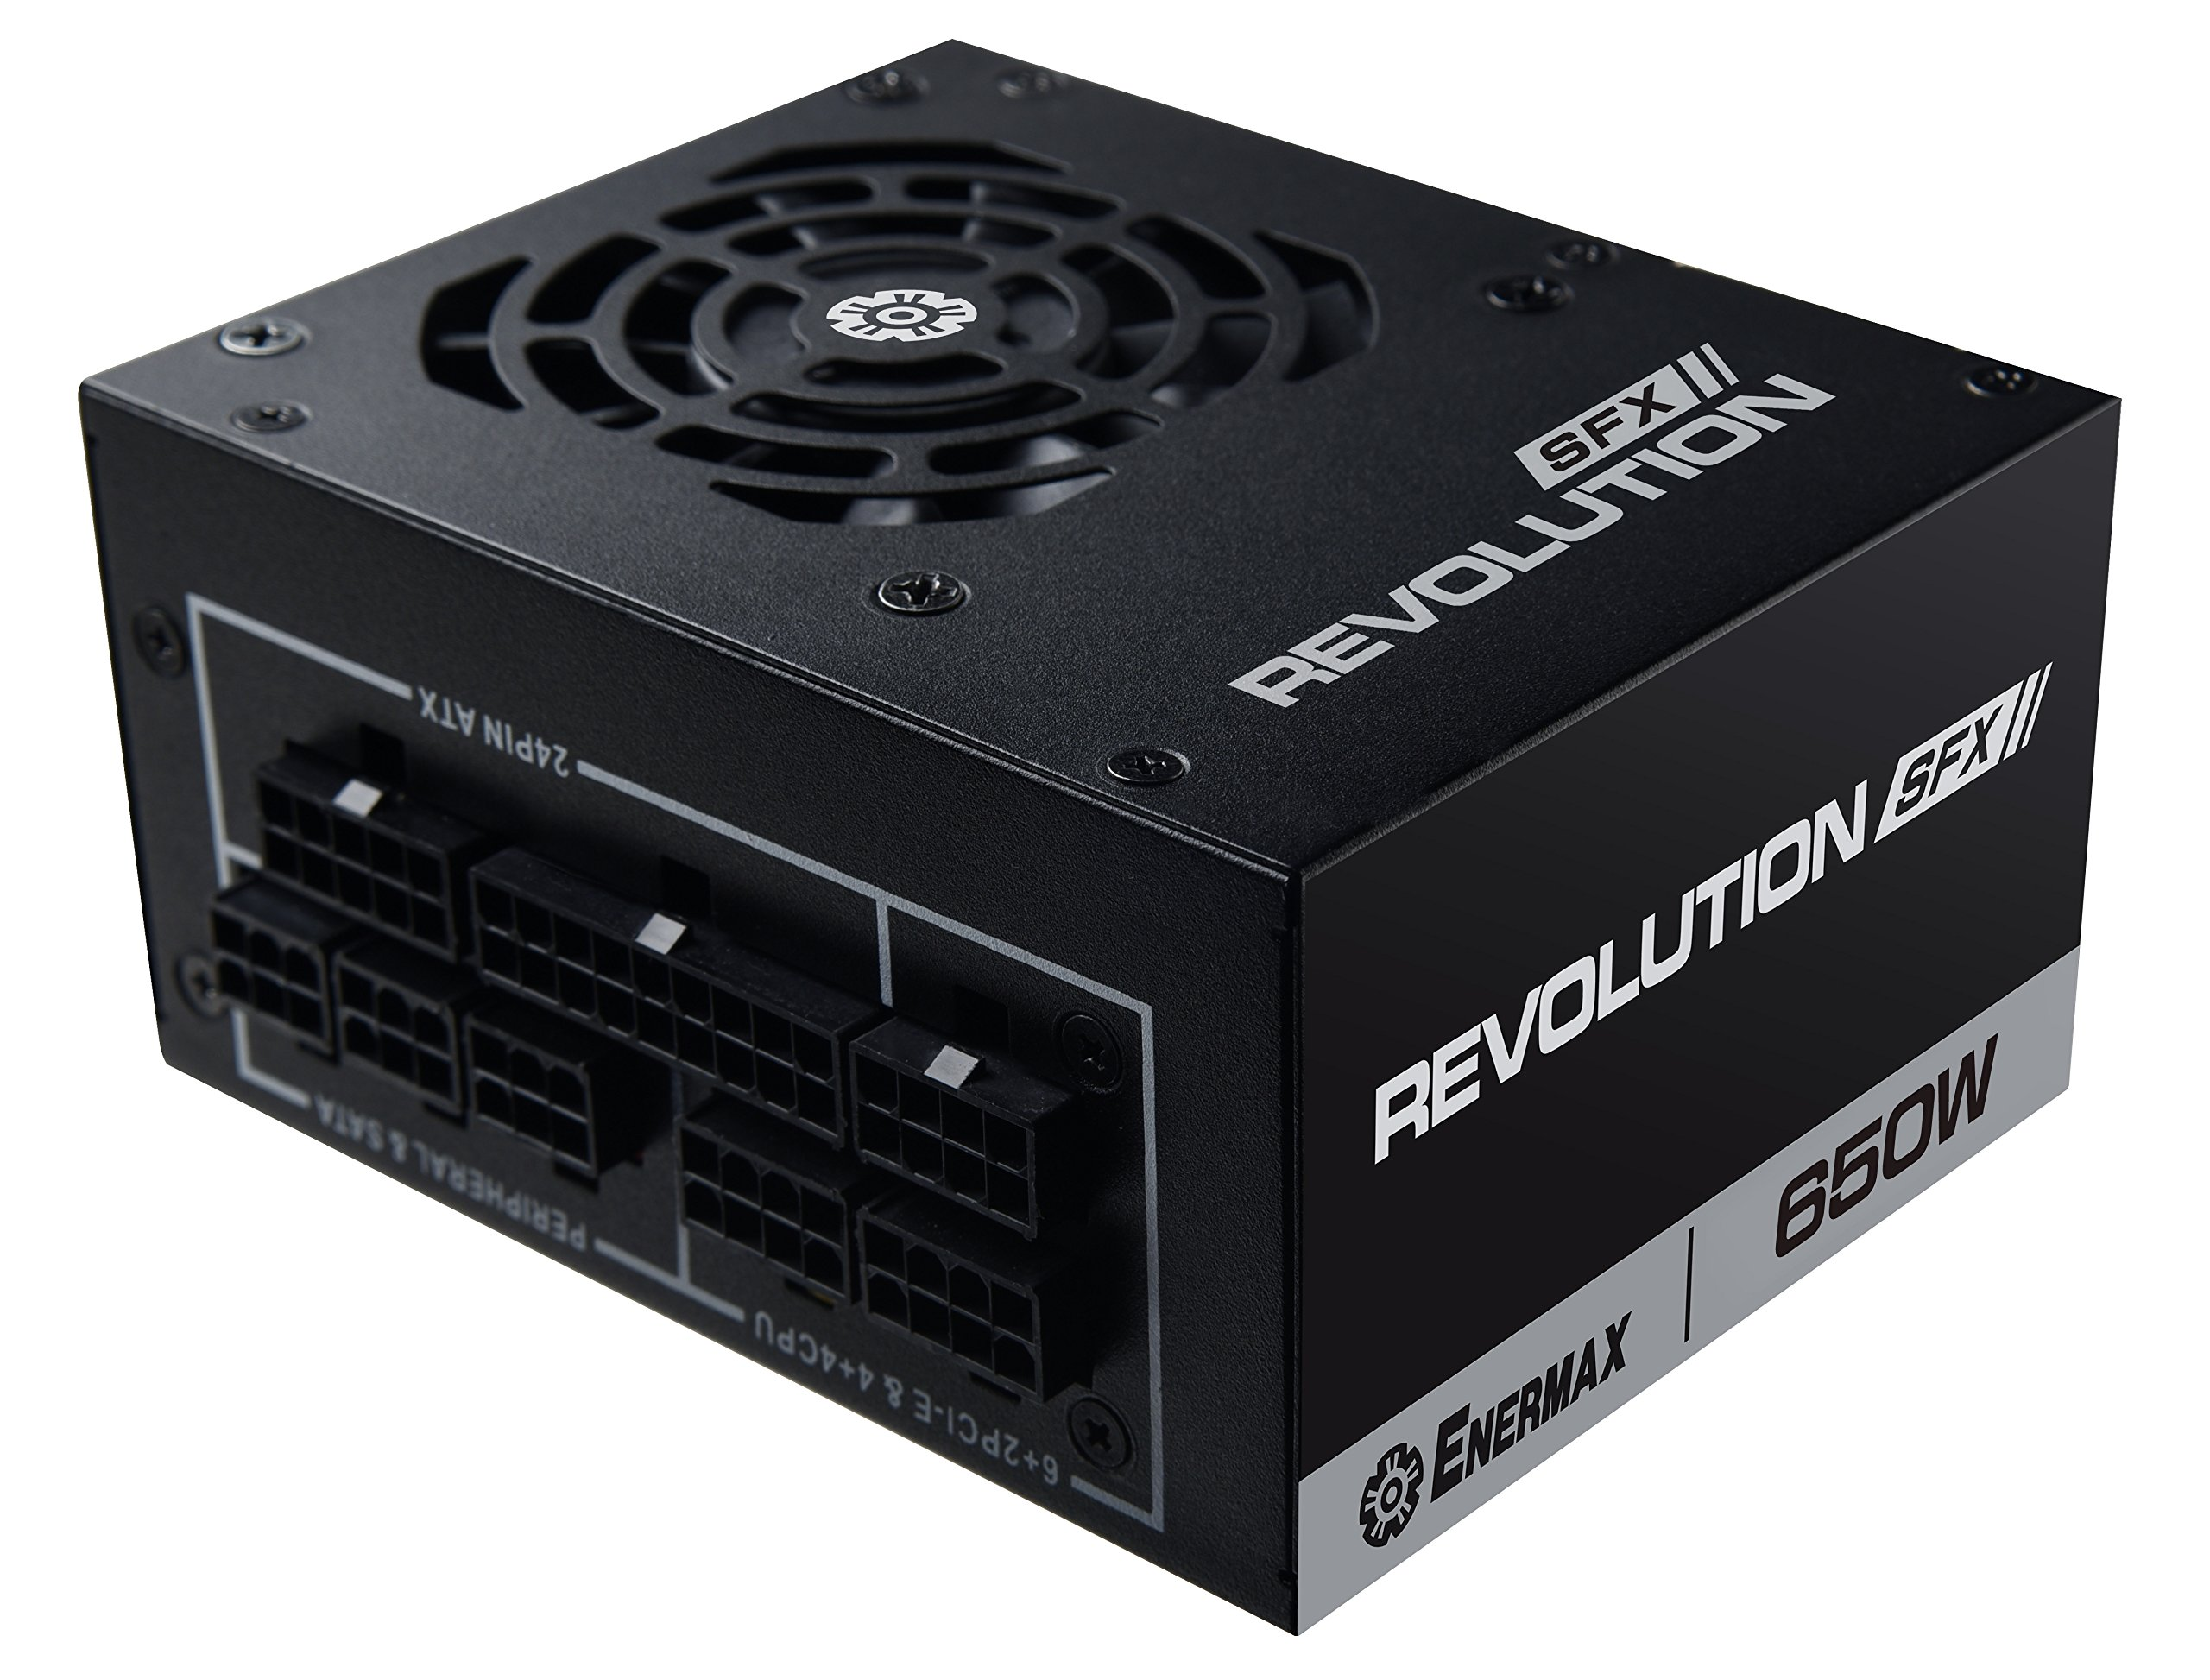 Enermax Revolution SFX 650W 80 PLUS Gold Full modular Semi-Fanless Power Supply with SFX-to-ATX PSU adapter bracket (ERV650SWT)Free Q-Boom Bluetooth Speaker inside